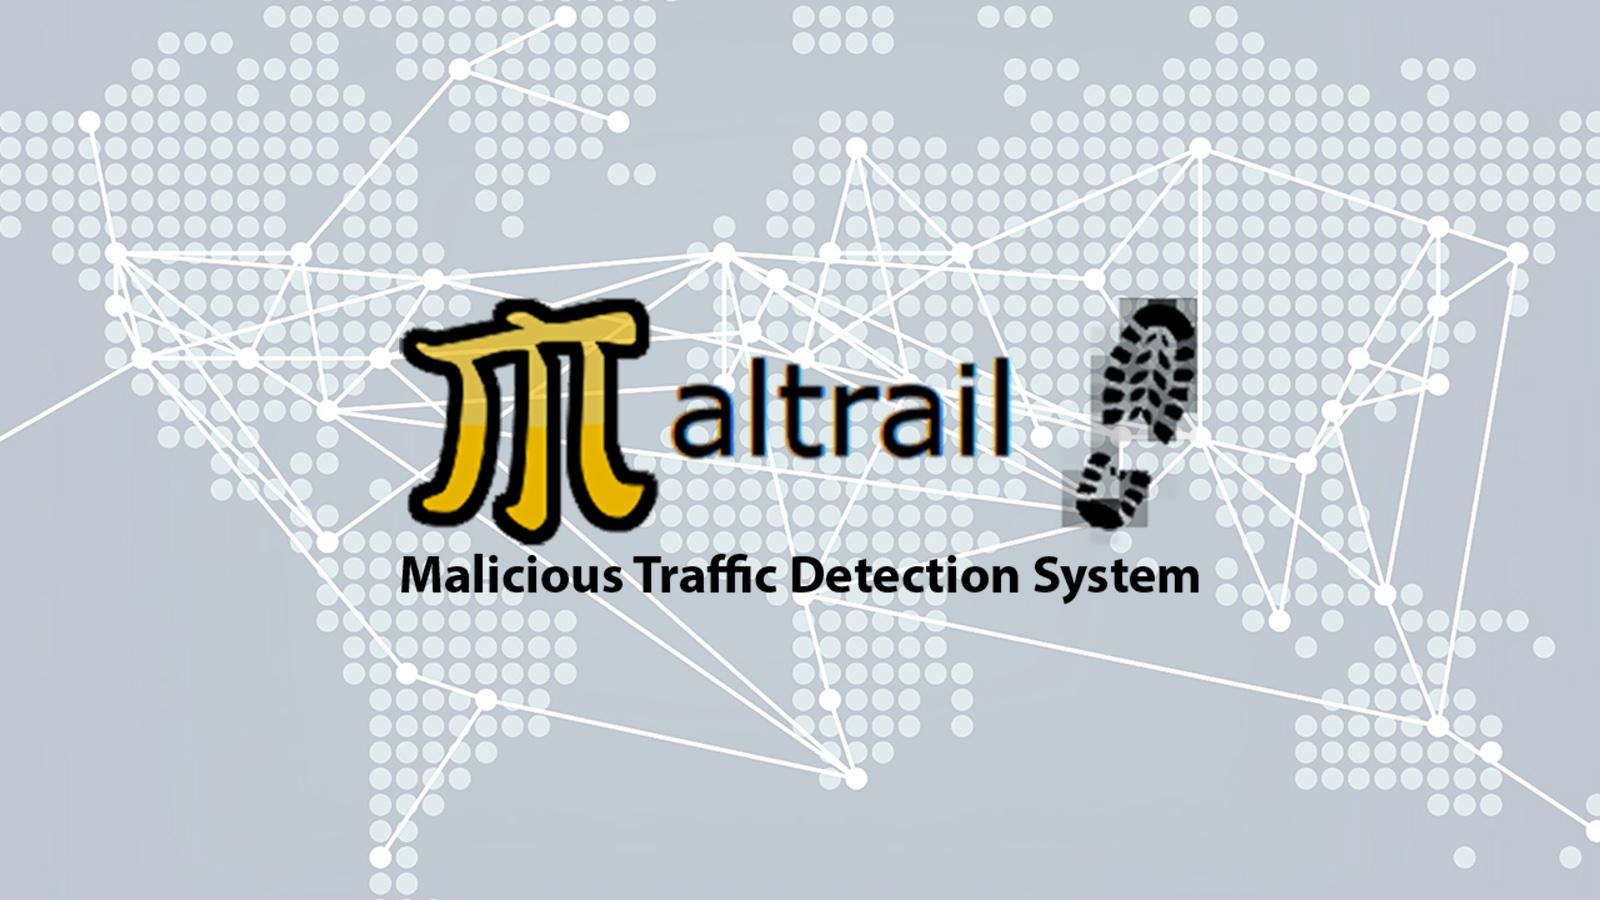 Maltrail - Malicious Traffic Detection System